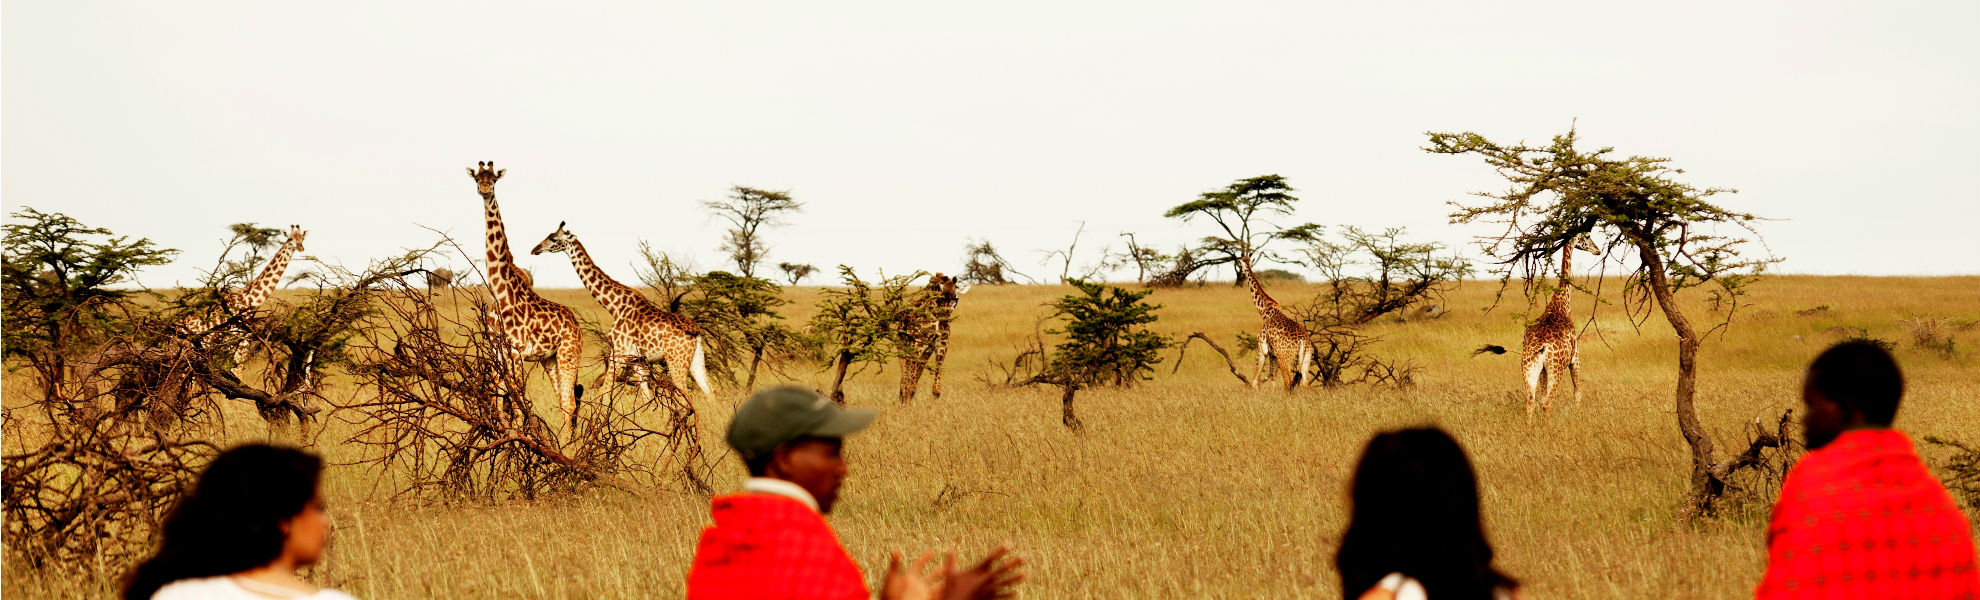 Fußpirsch am Karen Blixen Camp im Masai Mara Schutzgebiet